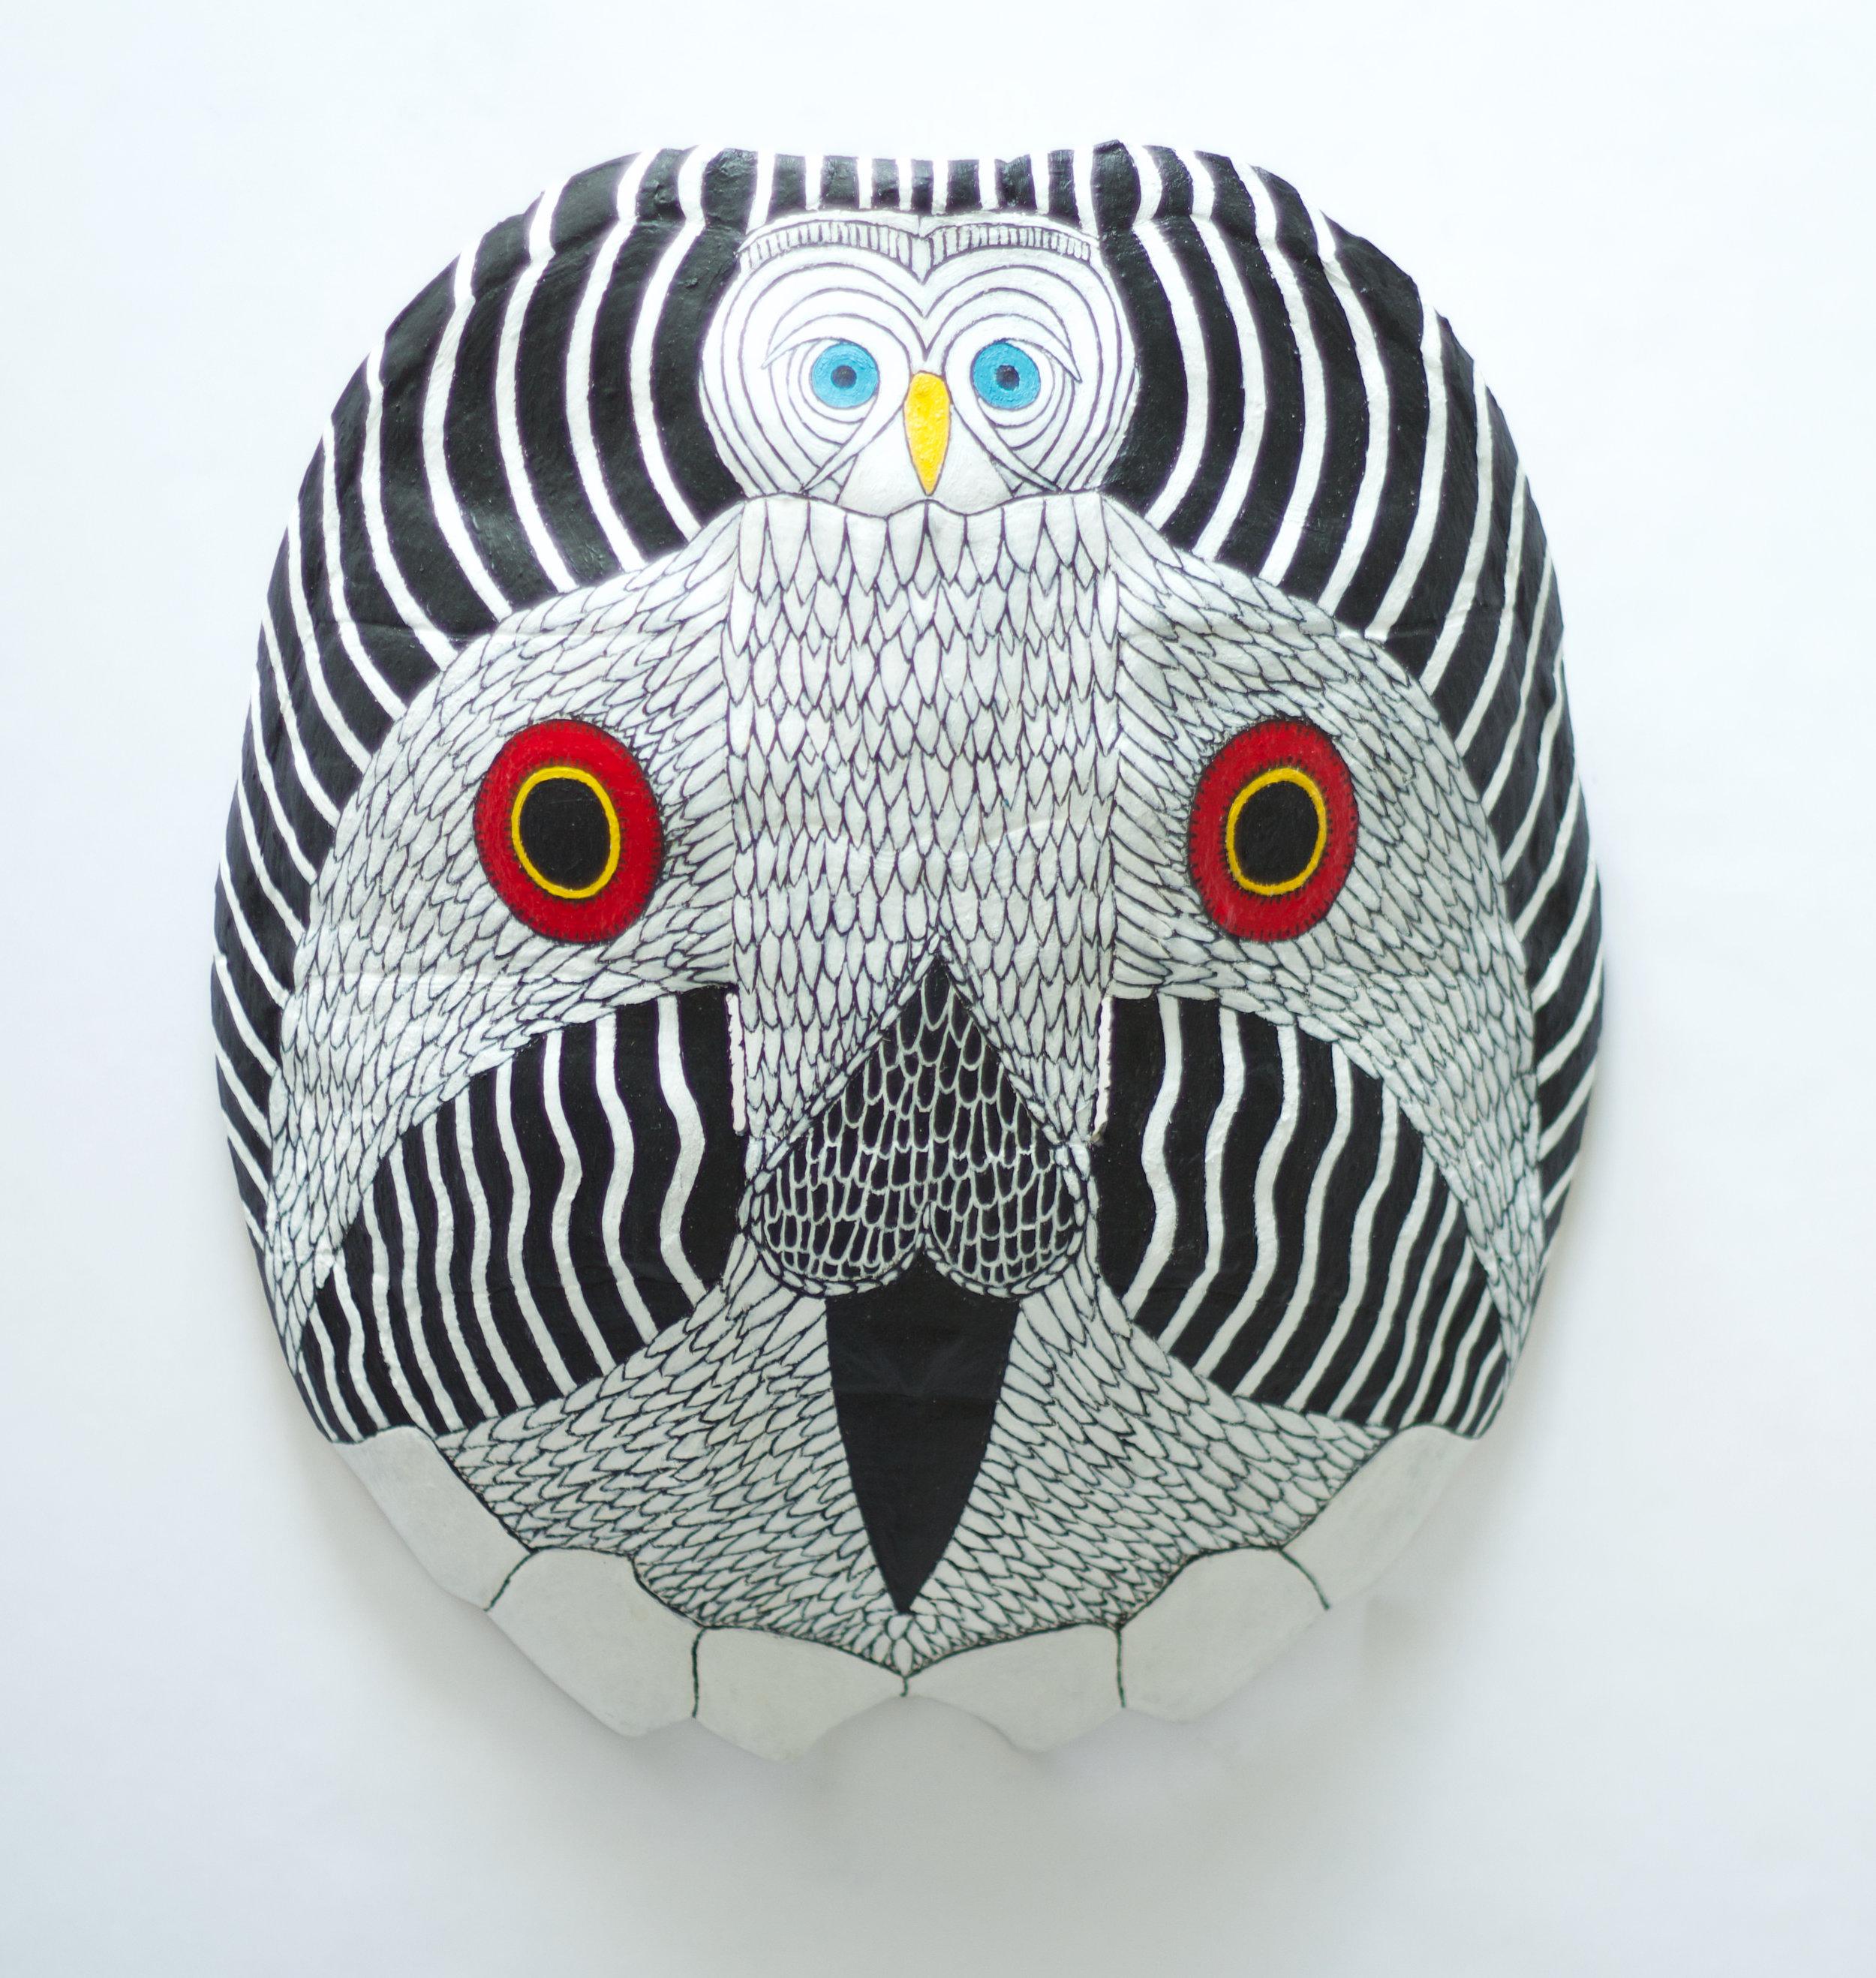 Turtle Owl Death Mask